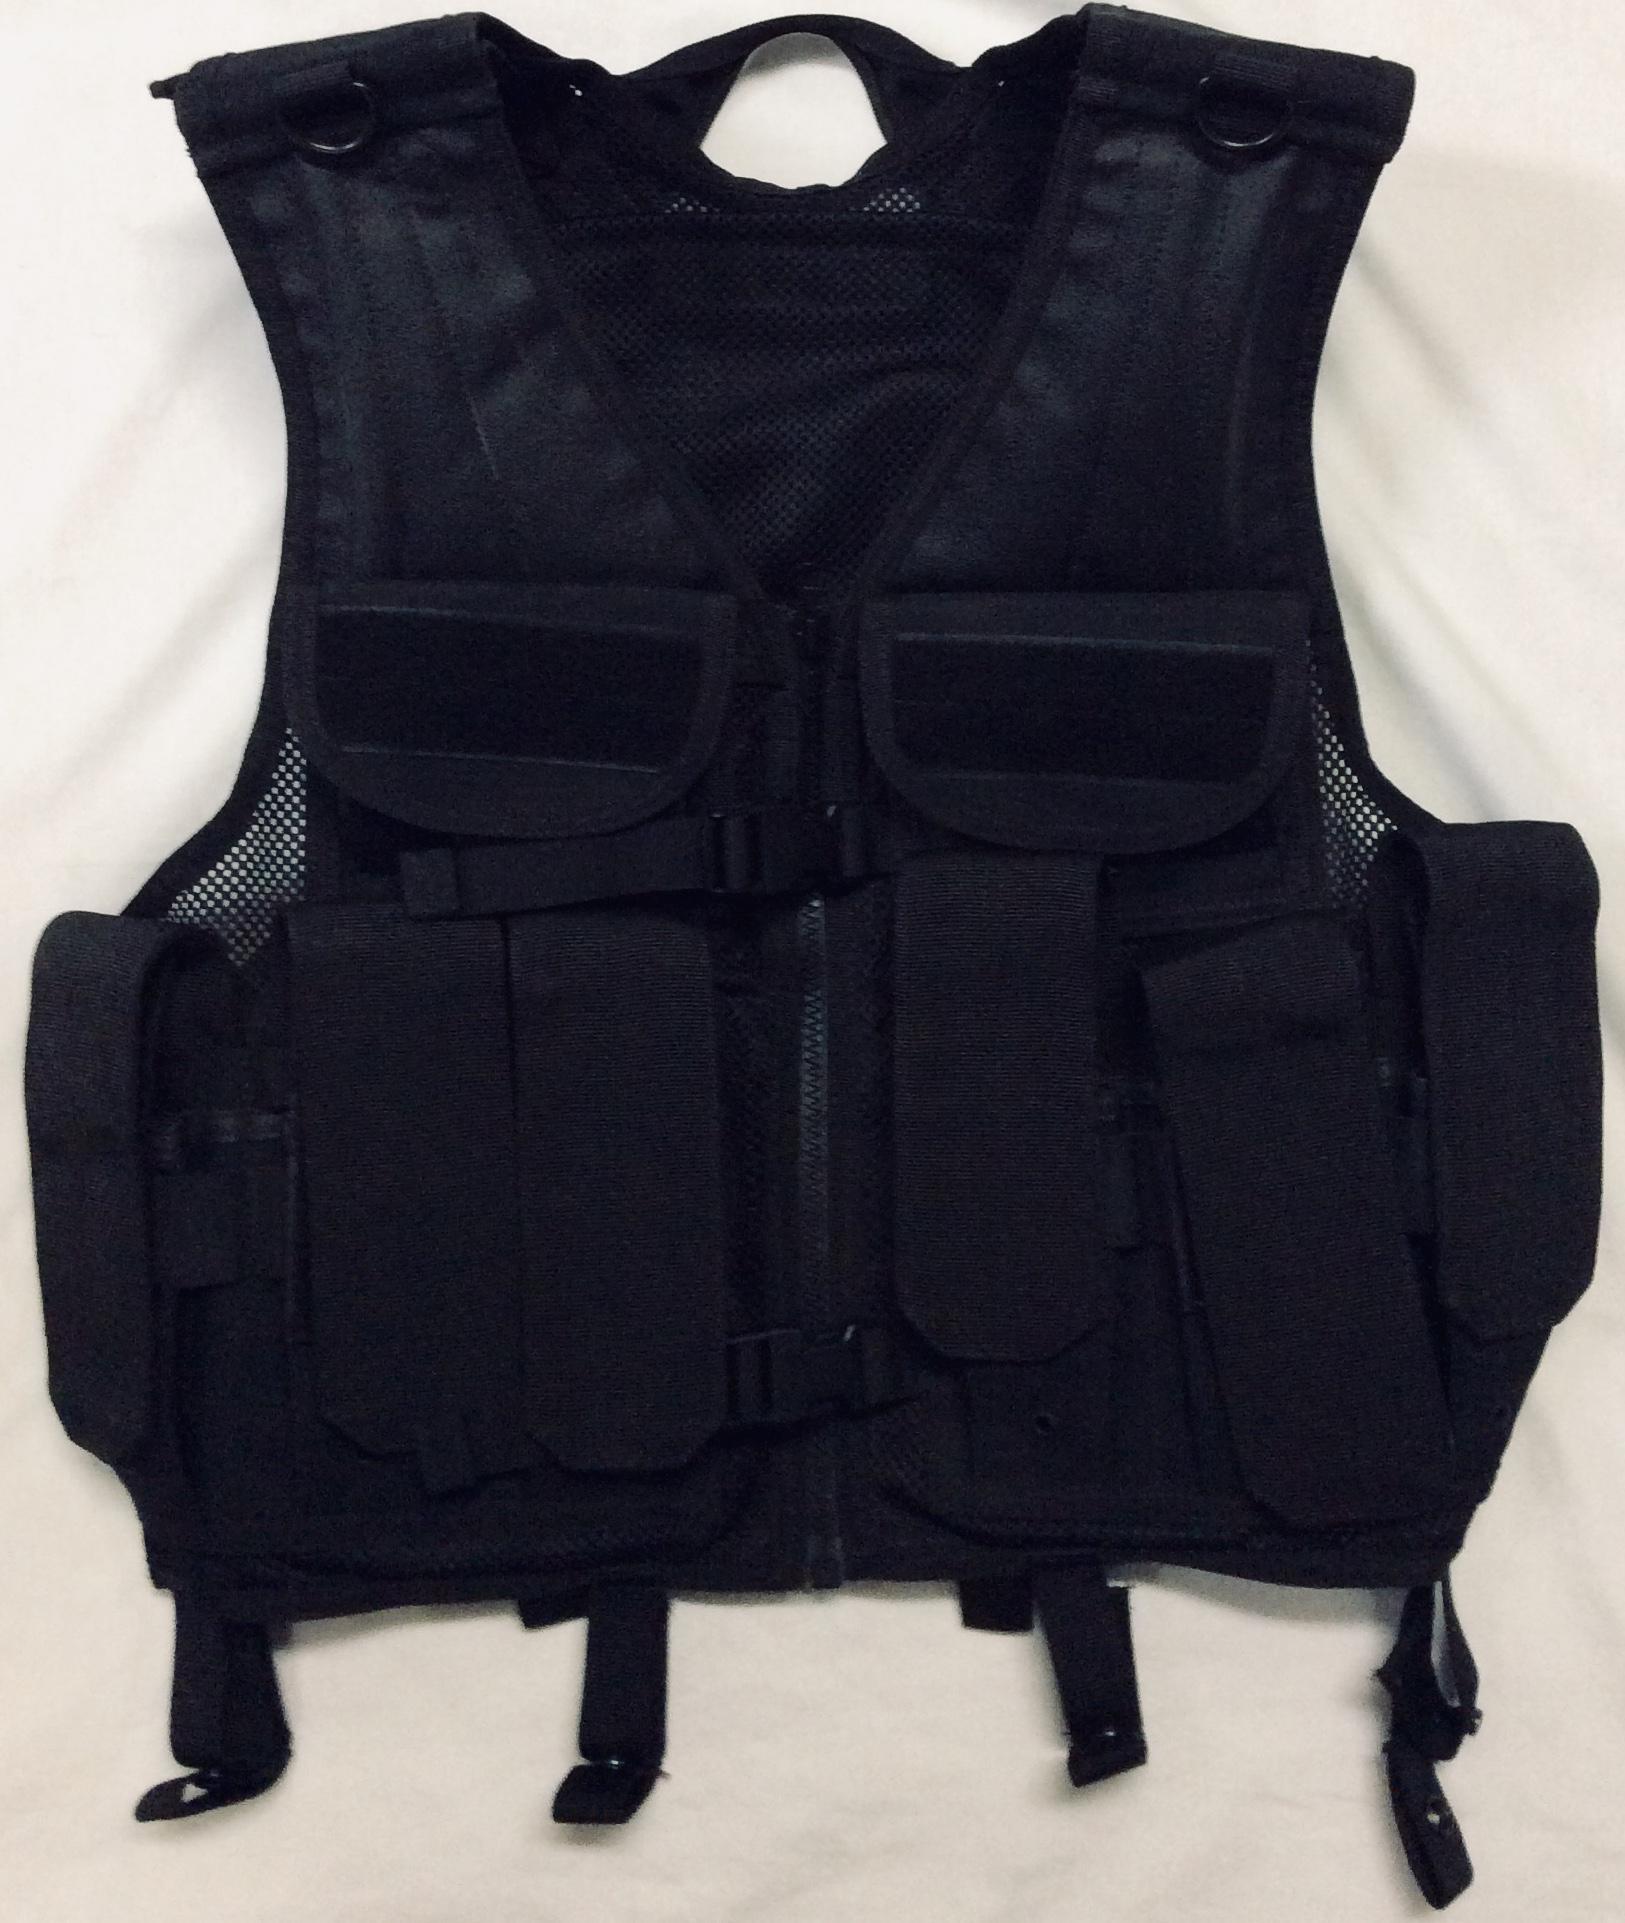 Black Mesh vest with multiple ammo